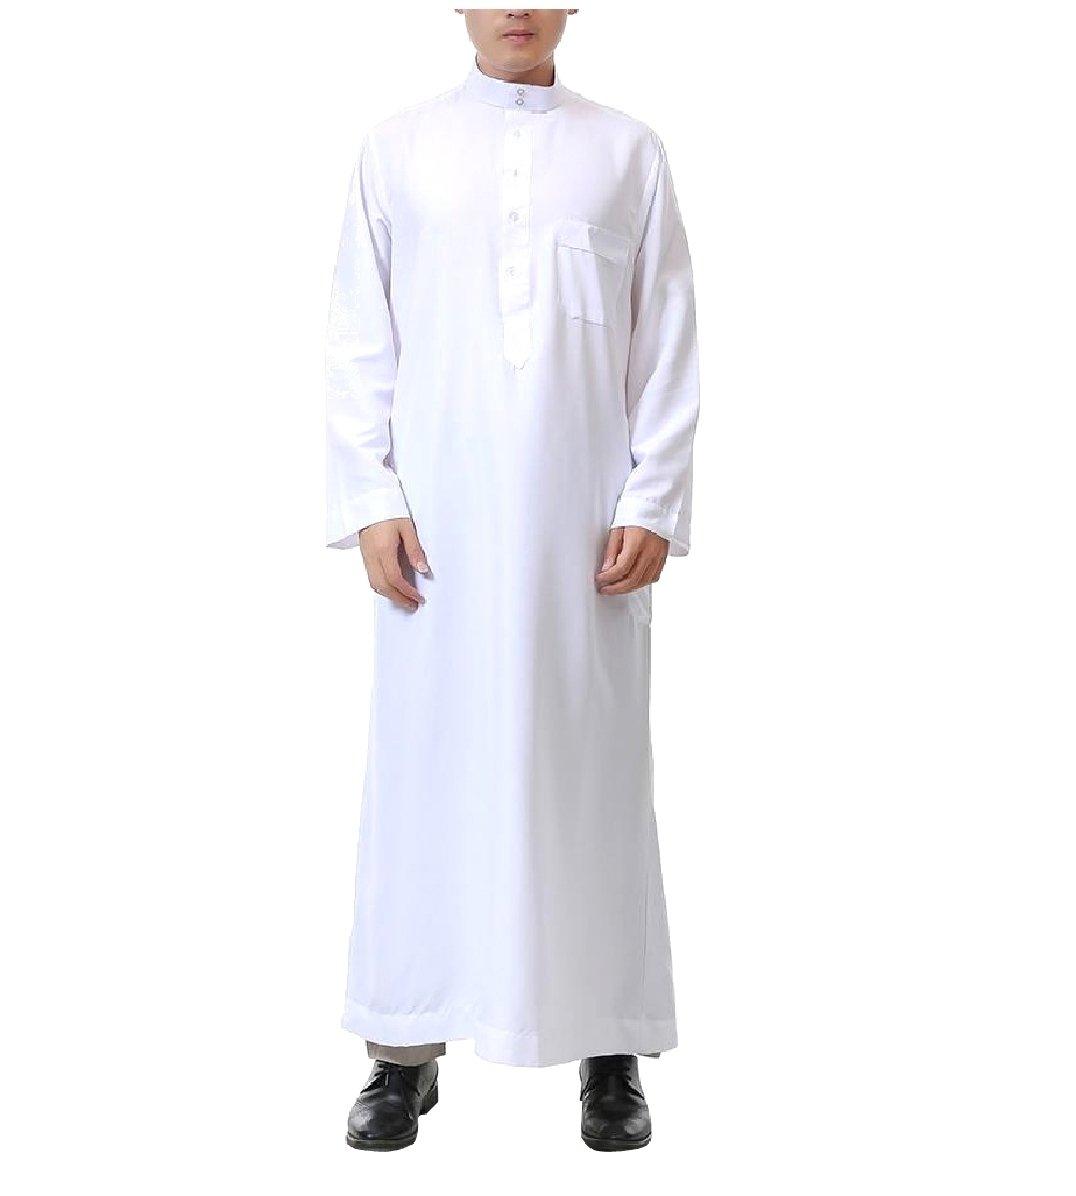 CuteRose Men's Islamic Pockets Mandarin Collar Middle East Muslim Thobe White 60